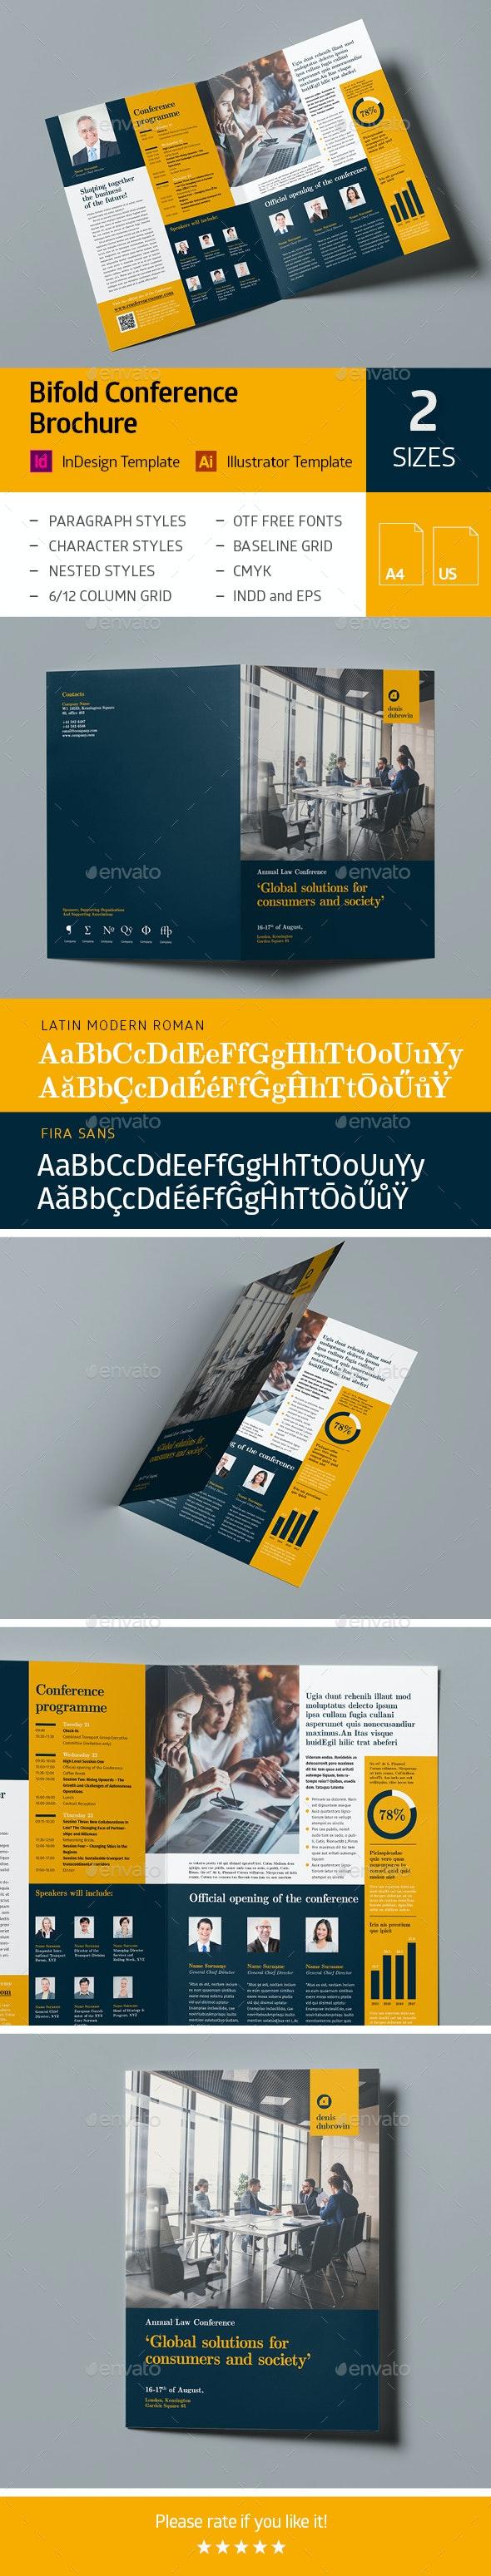 Bifold Conference Brochure - Corporate Brochures